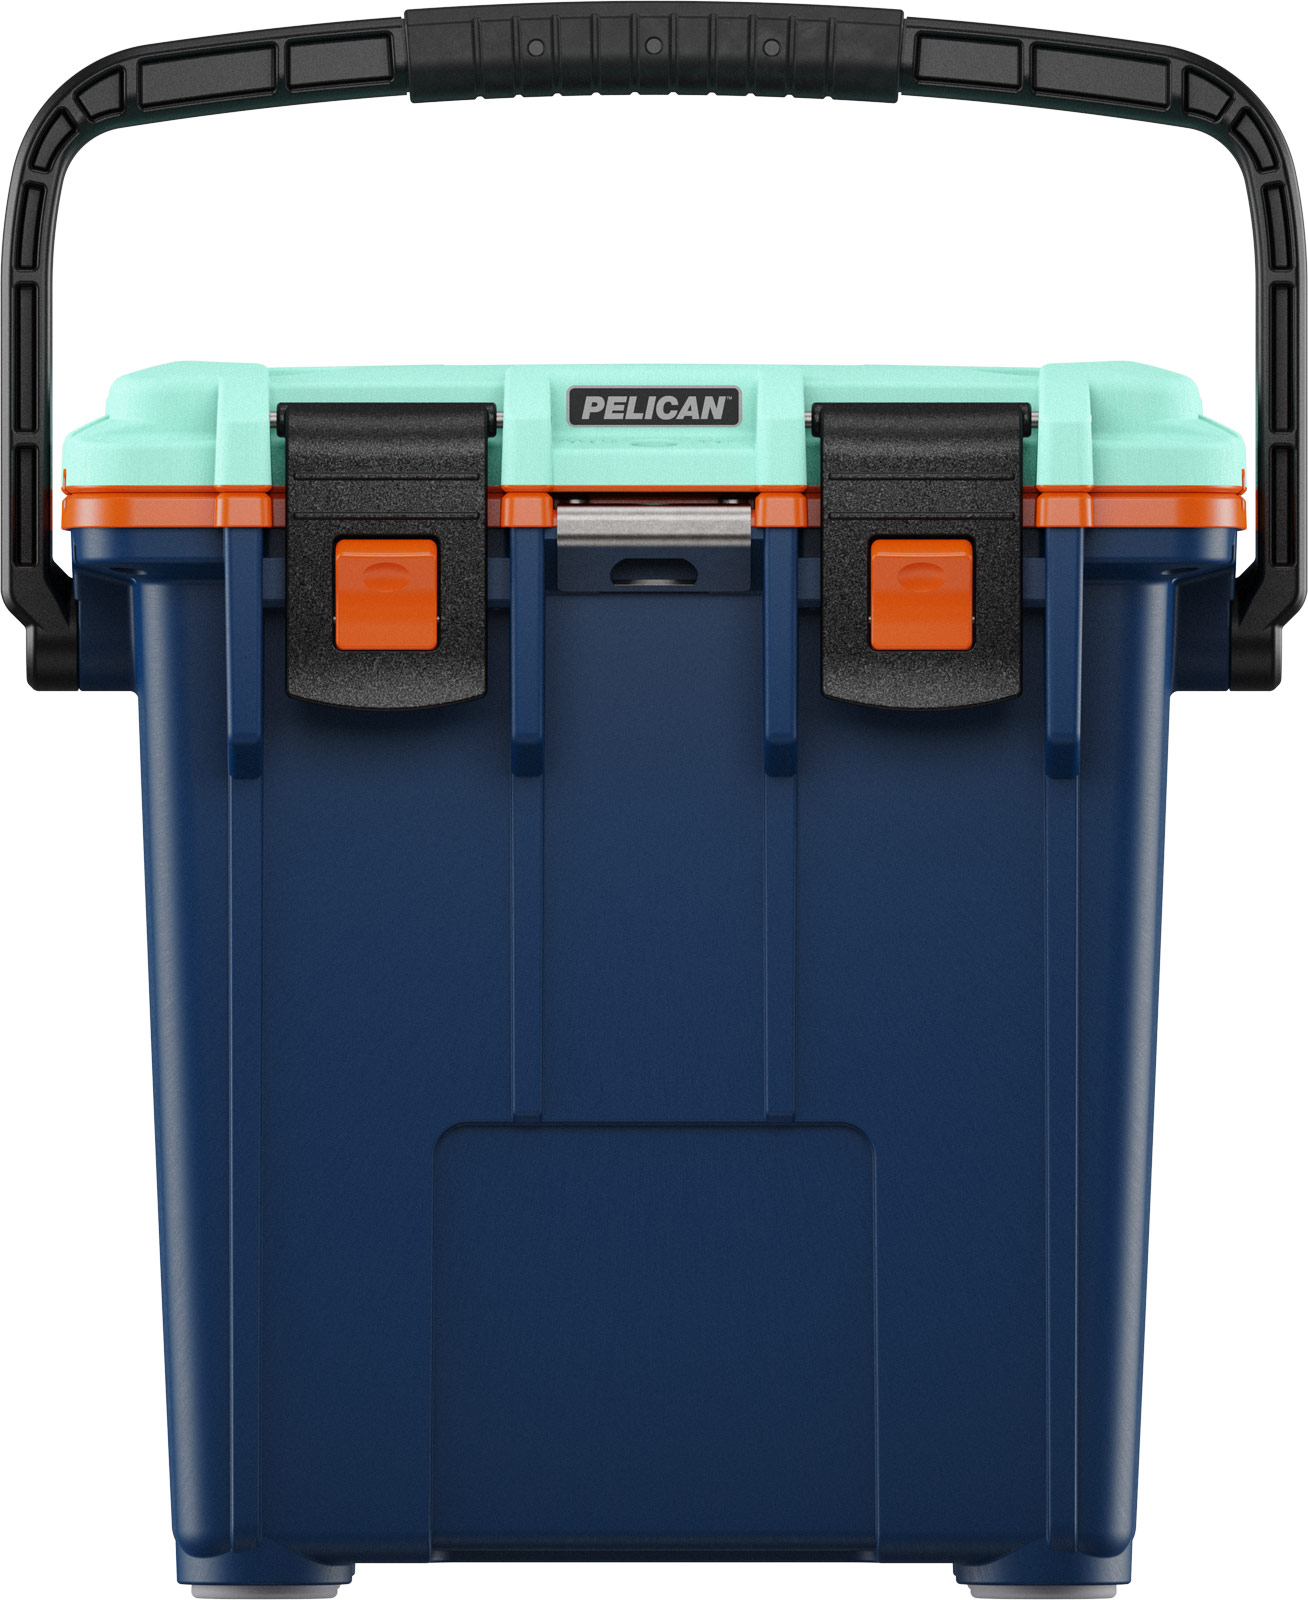 pelican beer cooler 20qt pacific blue orange seafoam